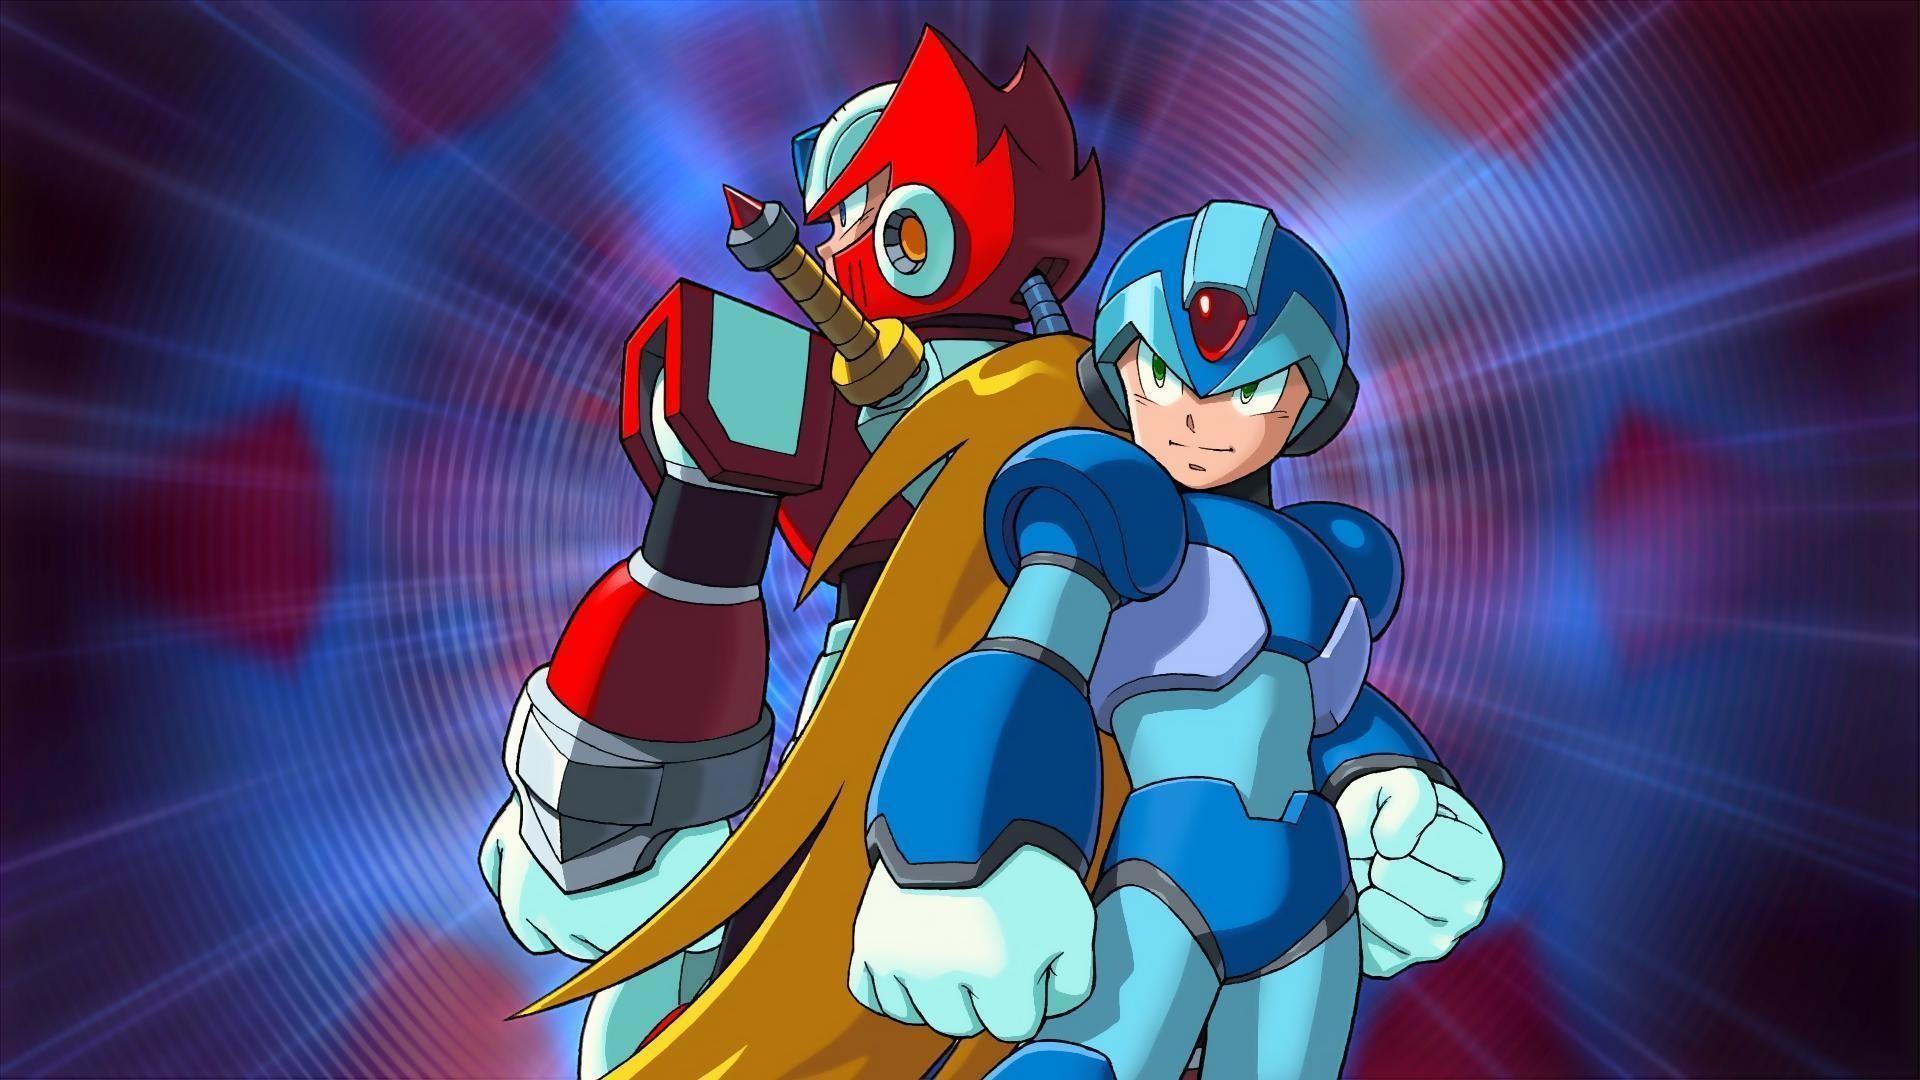 Megaman X: Zero and X[1] by Light-Rock on DeviantArt